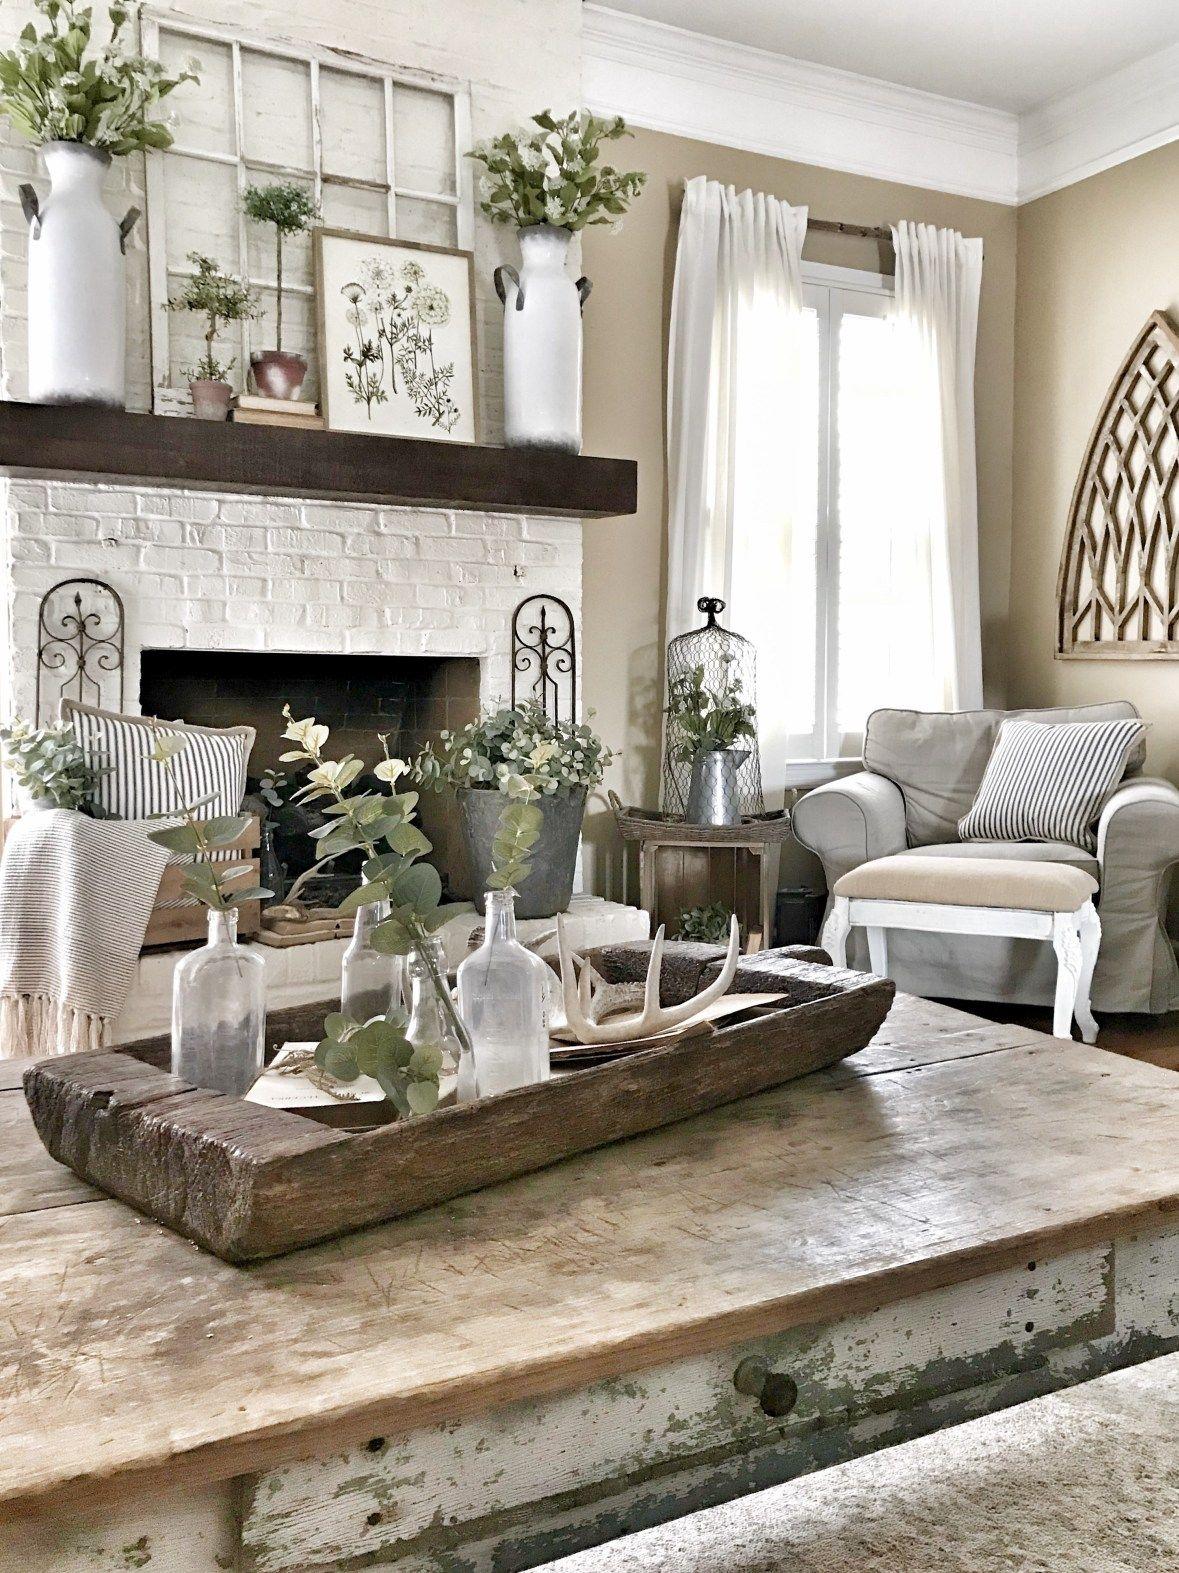 My Pottery Barn Shelf Mantel Hack Living room remodel